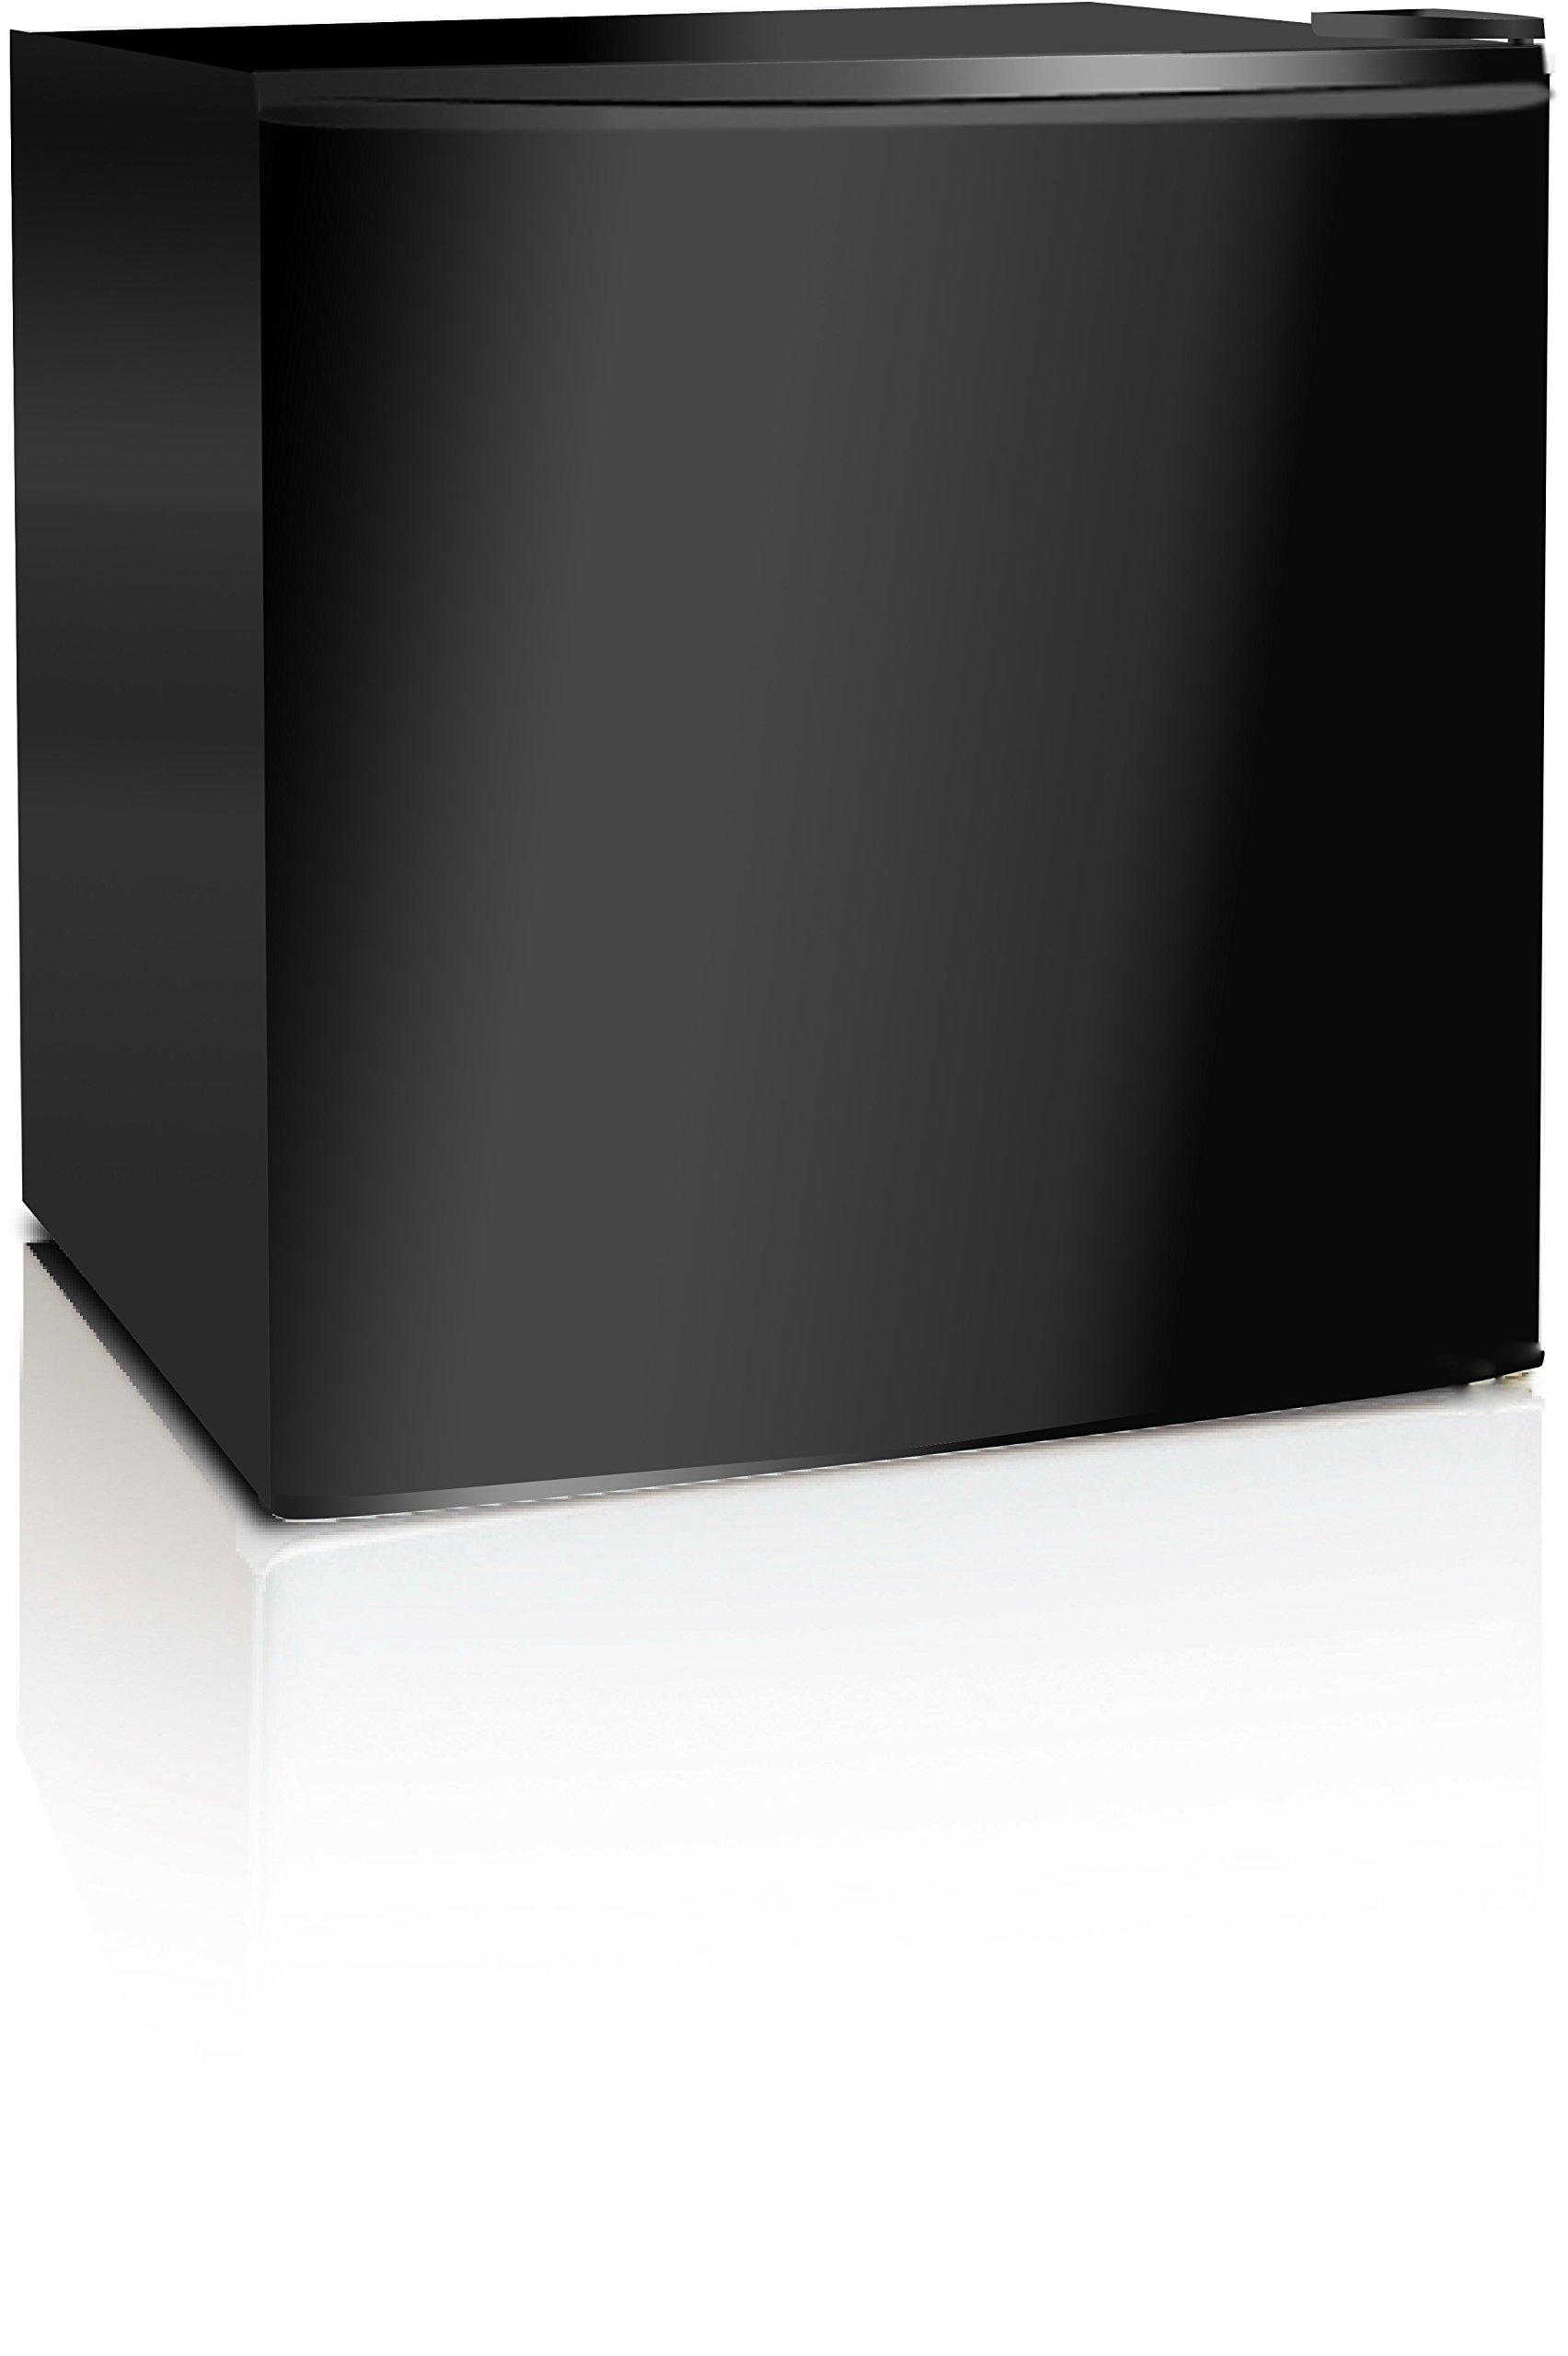 Midea WHS-65LB1 Compact Single Reversible Door Refrigerator, 1.6 Cubic Feet(0.045 Cubic Meter), Black by MIDEA